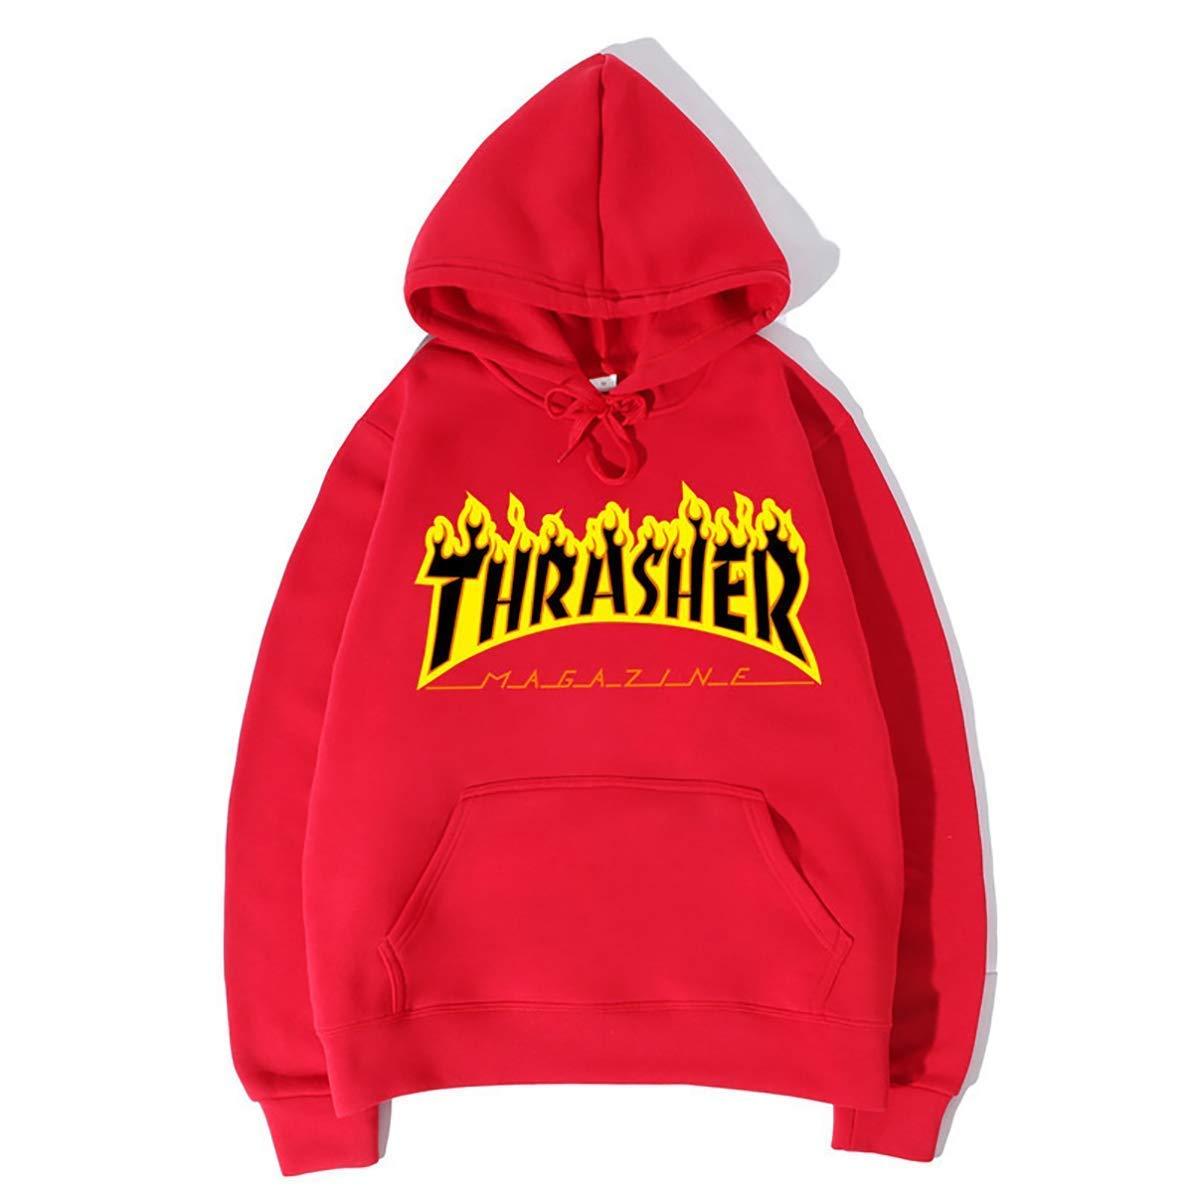 Red3 Large Men's Hooded Sweatshirt Sportswear Long Sleeve Print Loose Baseball Uniform Warm Autumn and Winter Plus Velvet Letters Flame